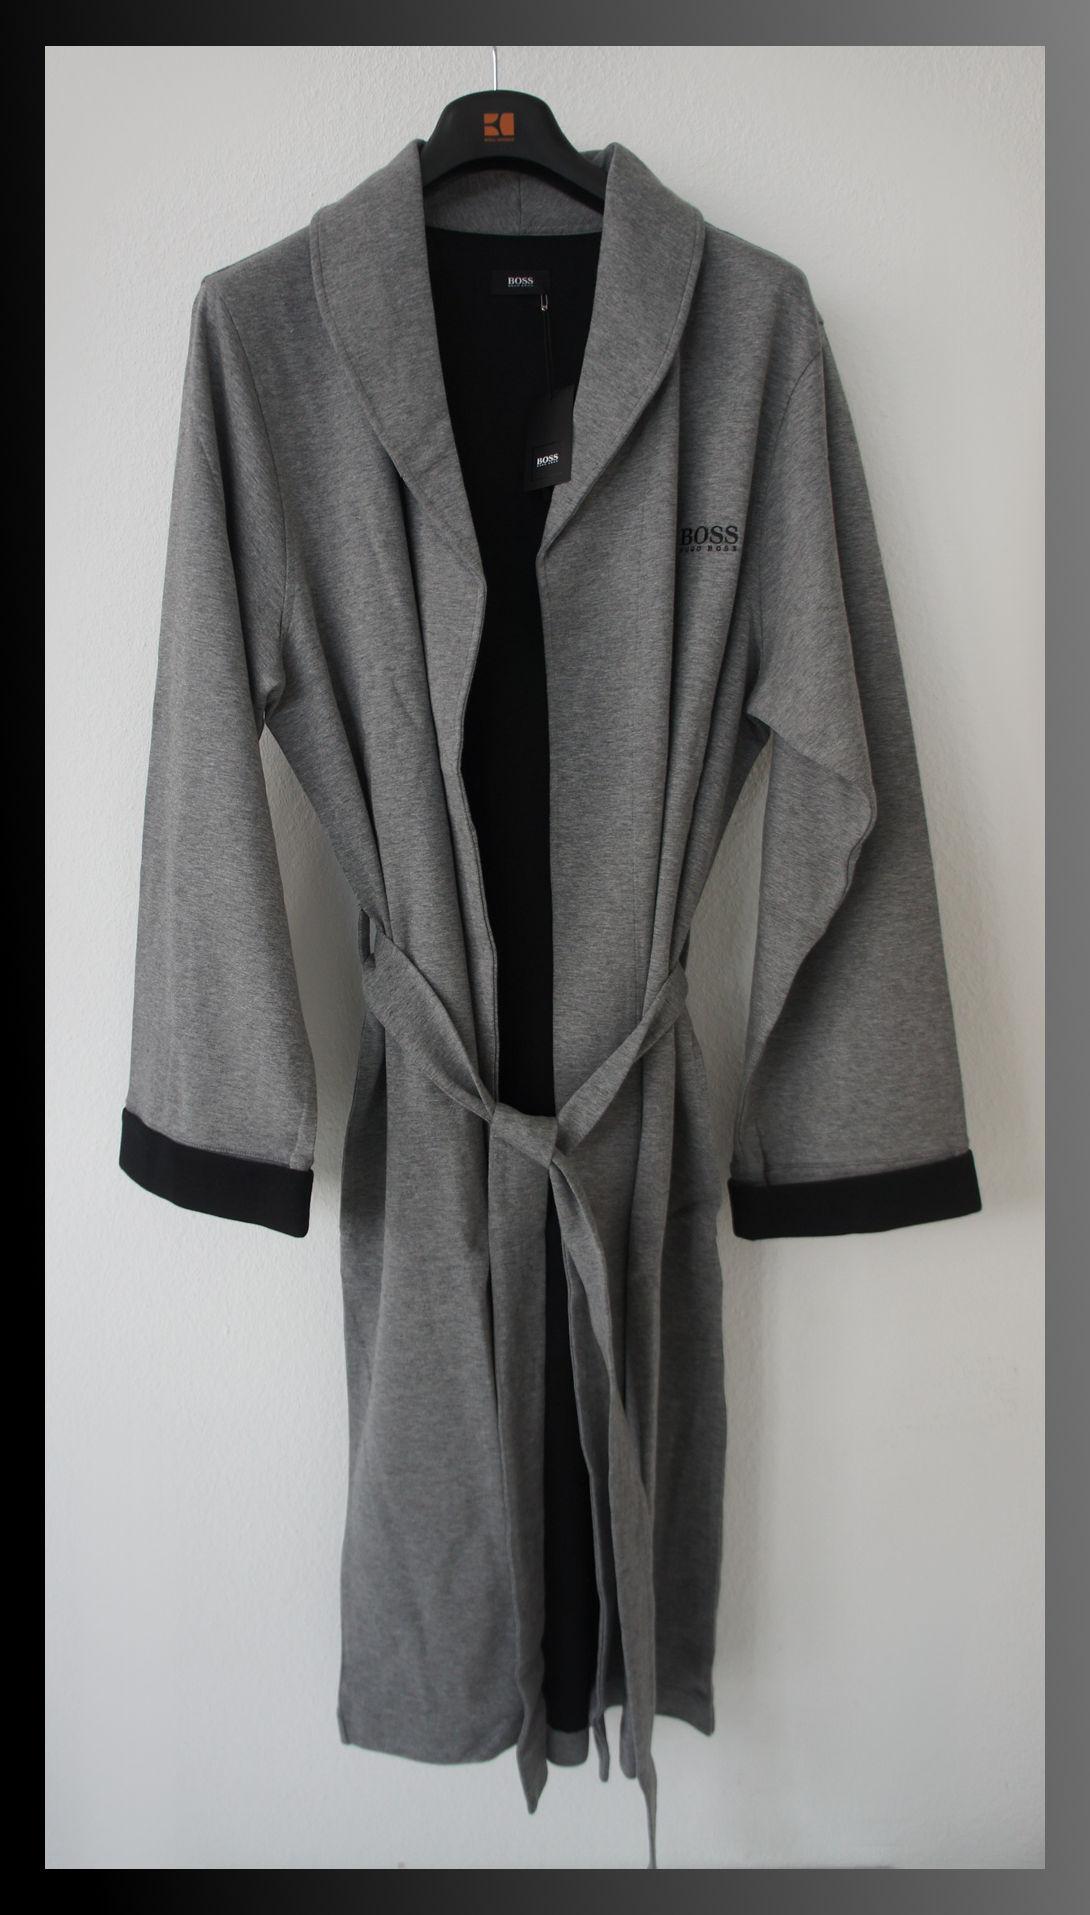 hugo boss bademantel morgenmantel gr s grau schwarz uvp 129euro neu ebay. Black Bedroom Furniture Sets. Home Design Ideas